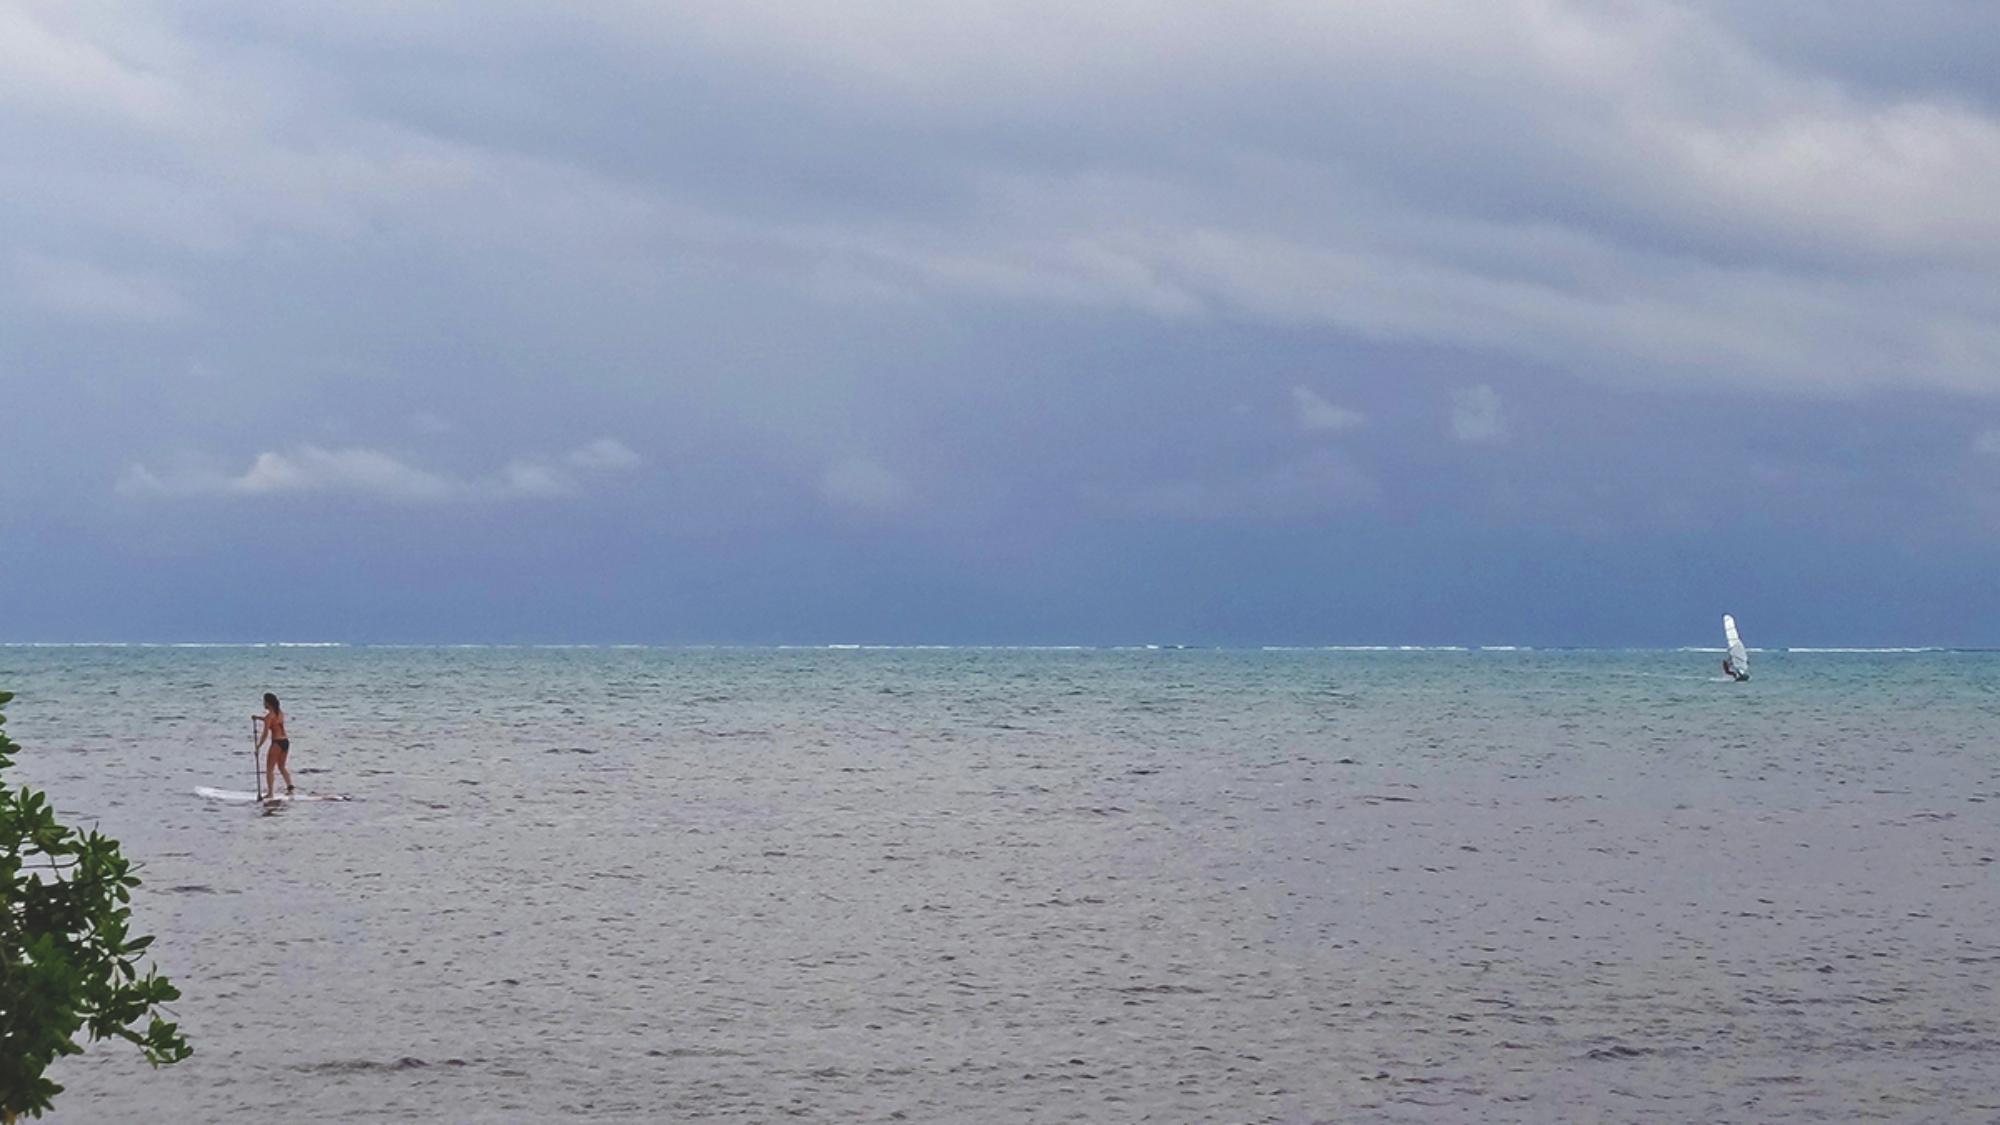 Cay Caulker, Belize